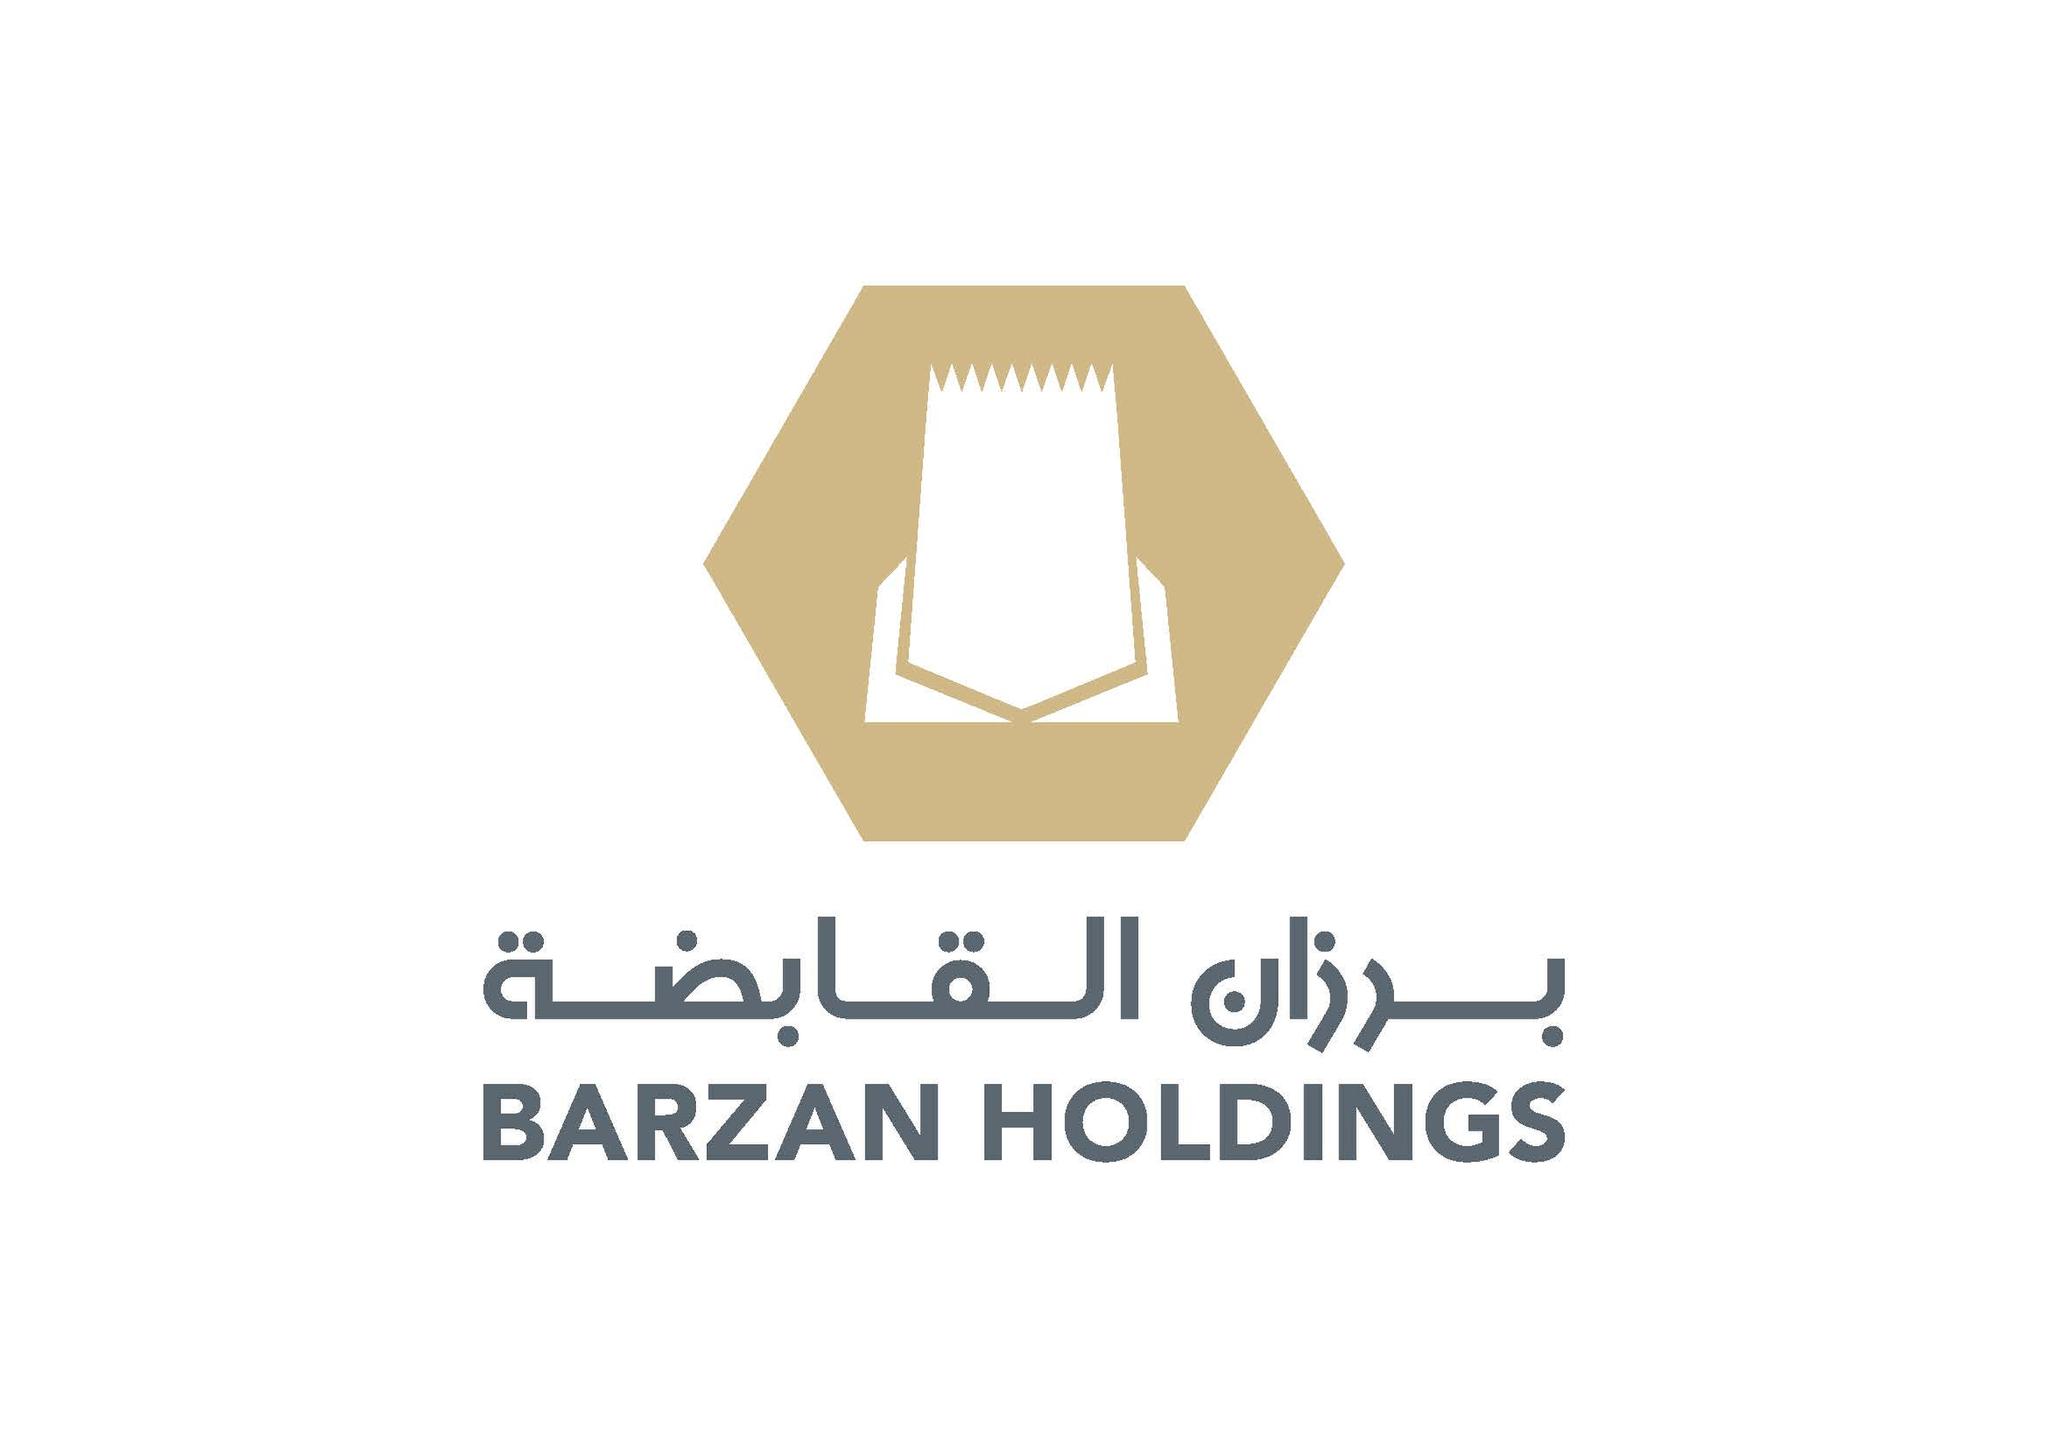 Barzan Holdings